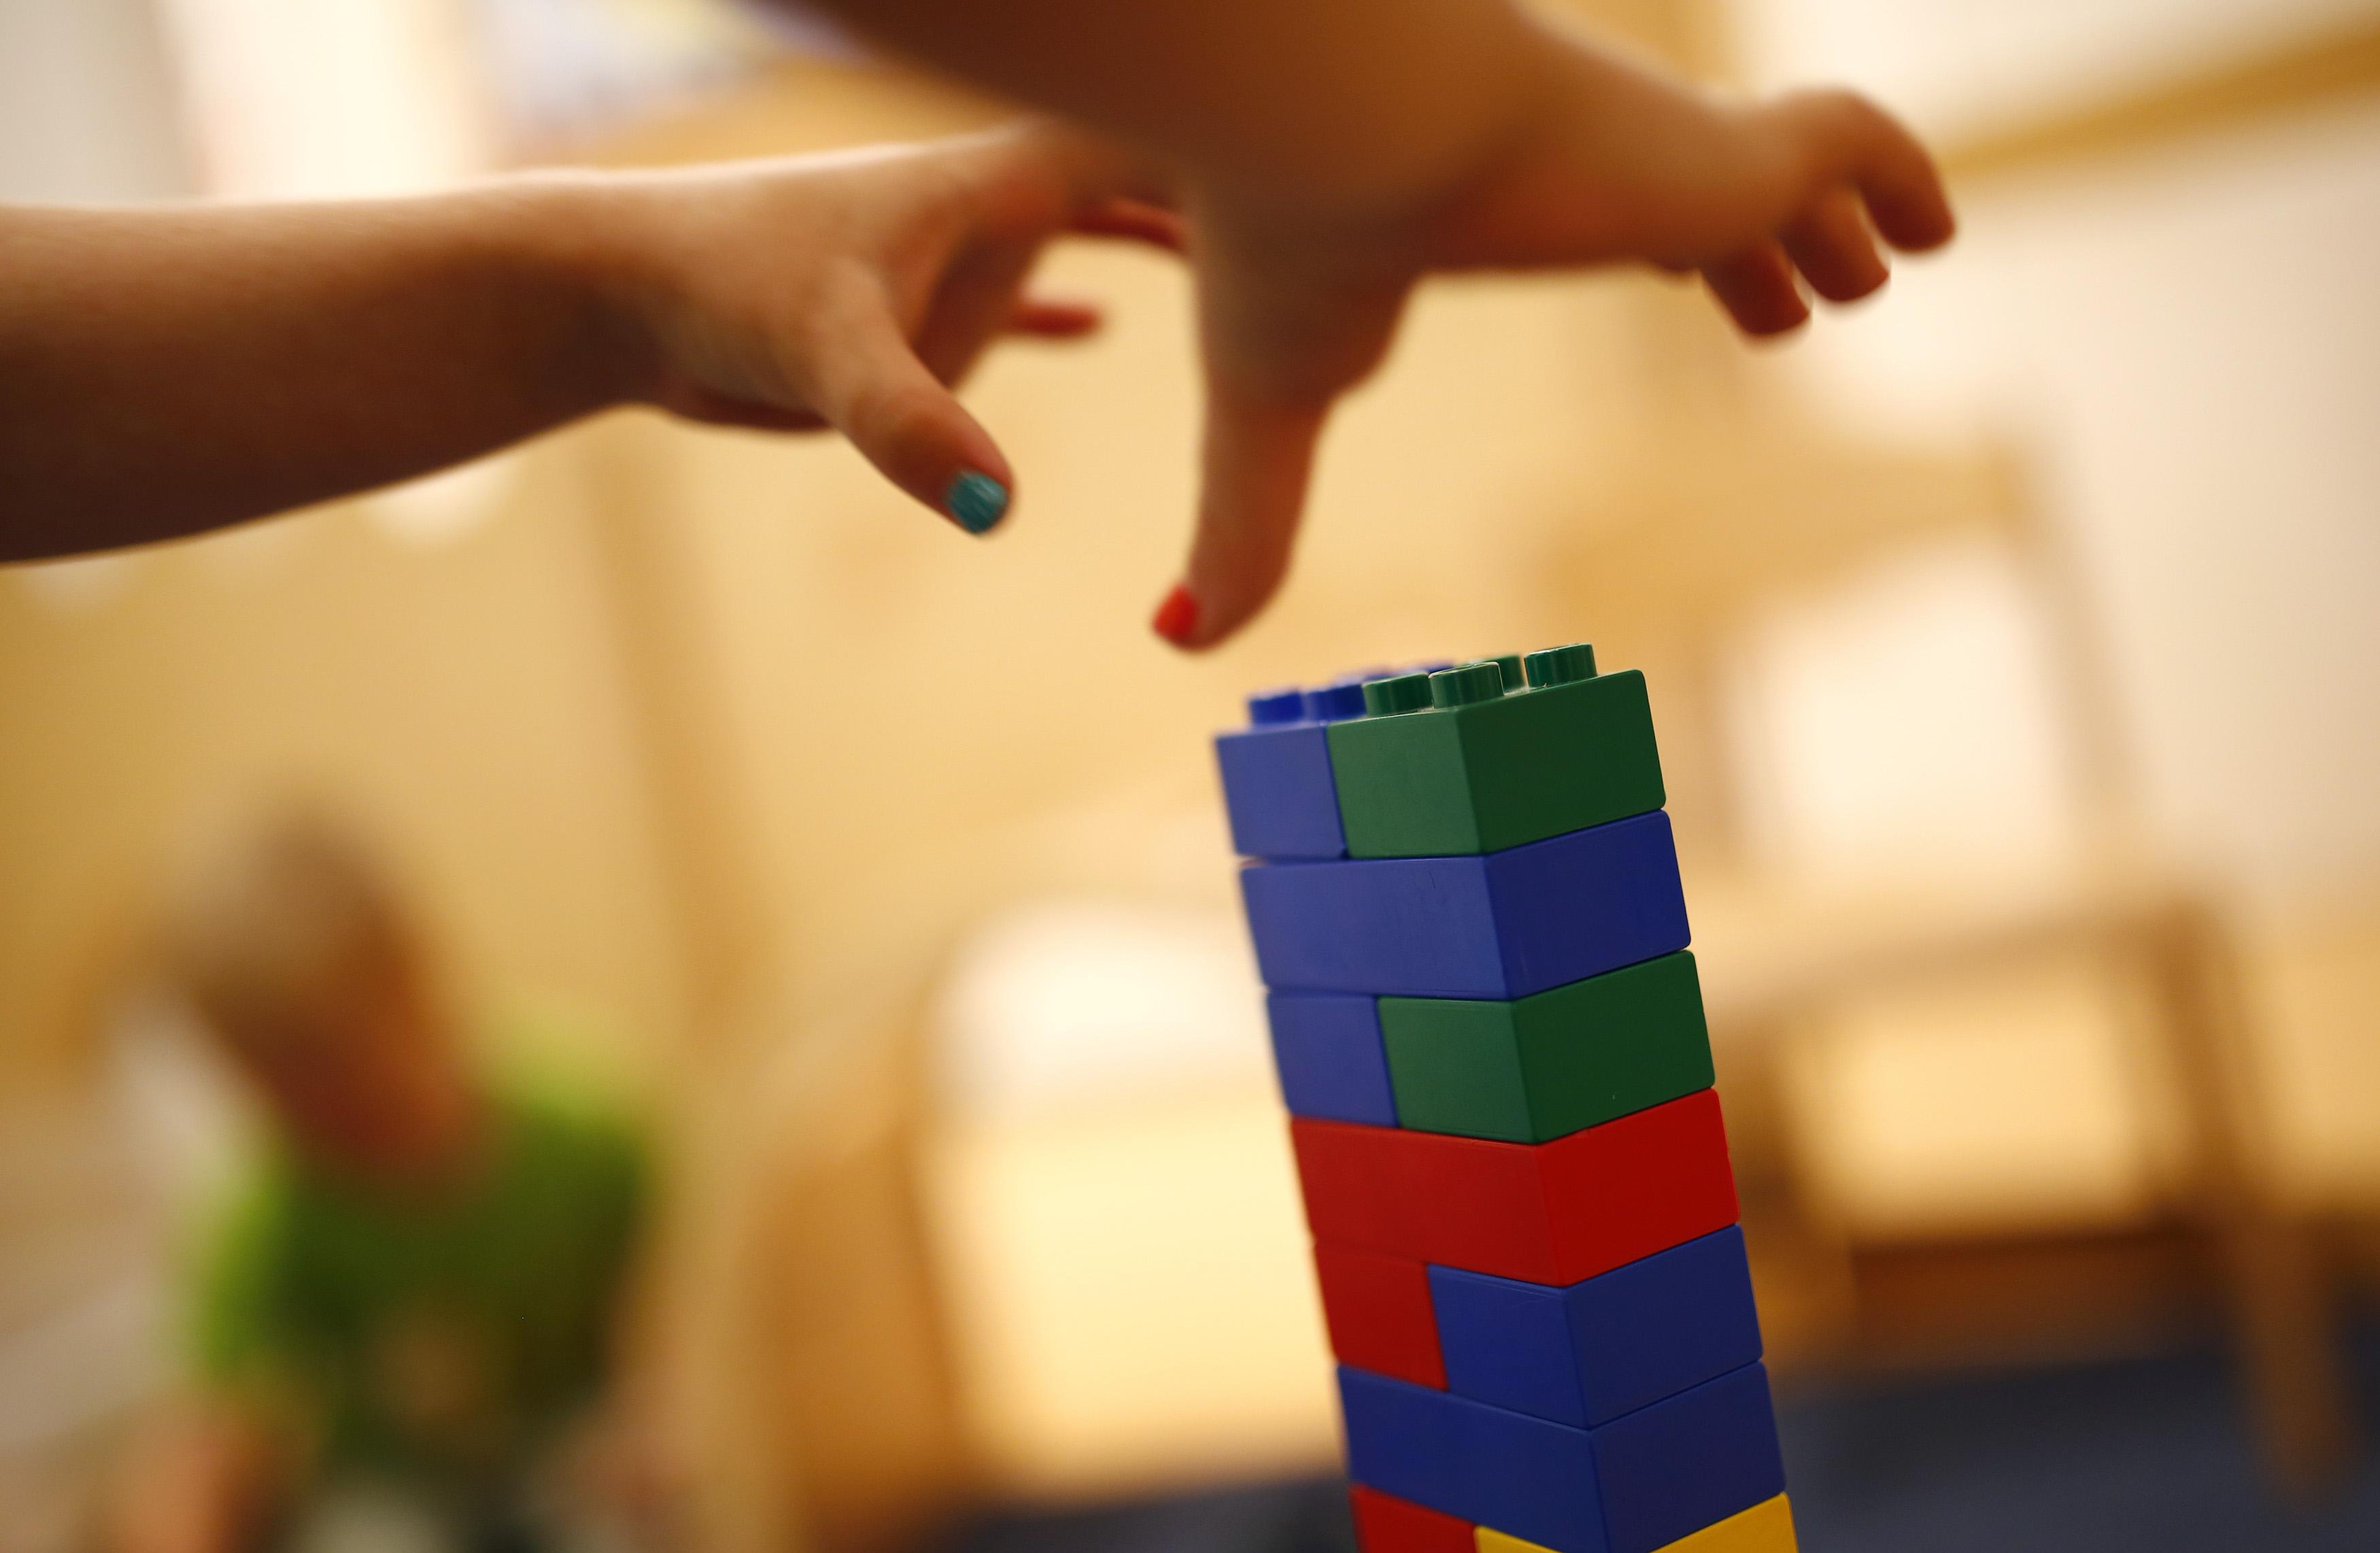 FILE - A child grabs LEGO bricks at a Kindergarten in Hanau, Germany, July 16, 2013. (Reuters)